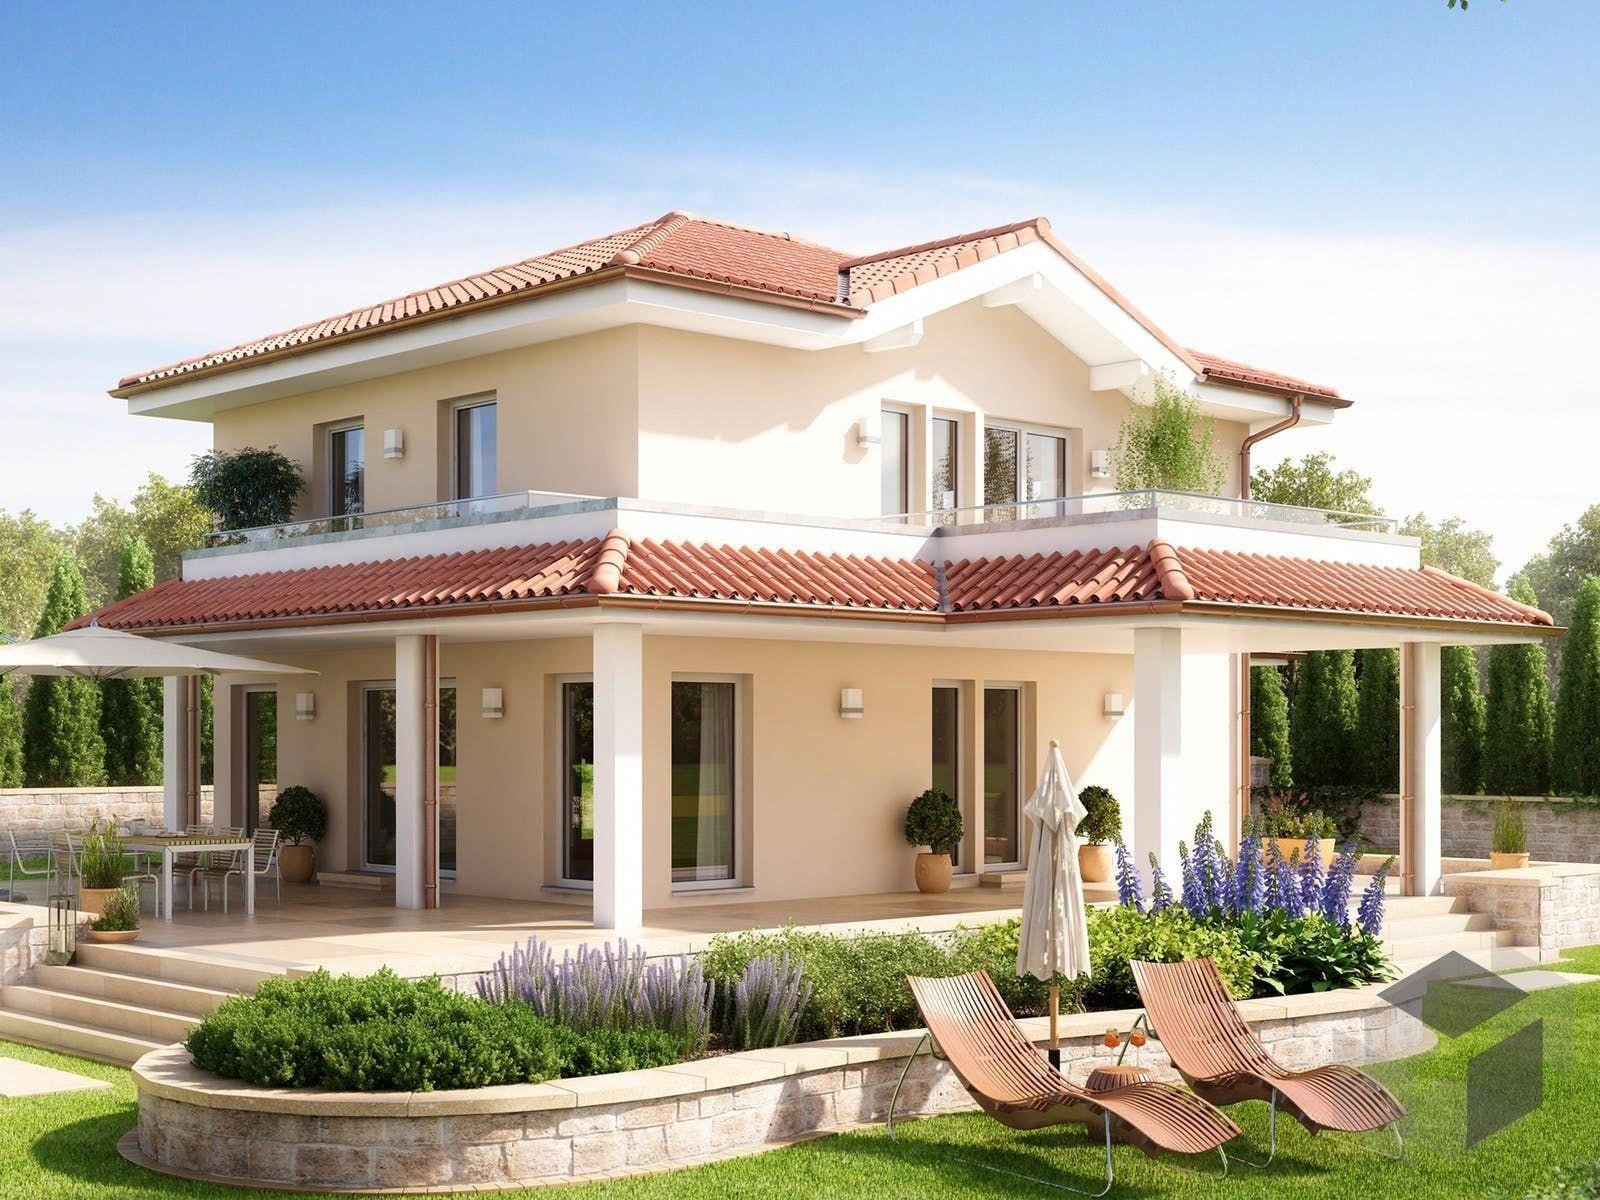 casaspequeñas house designs exterior house exterior on most popular modern dream house exterior design ideas the best destination id=84196